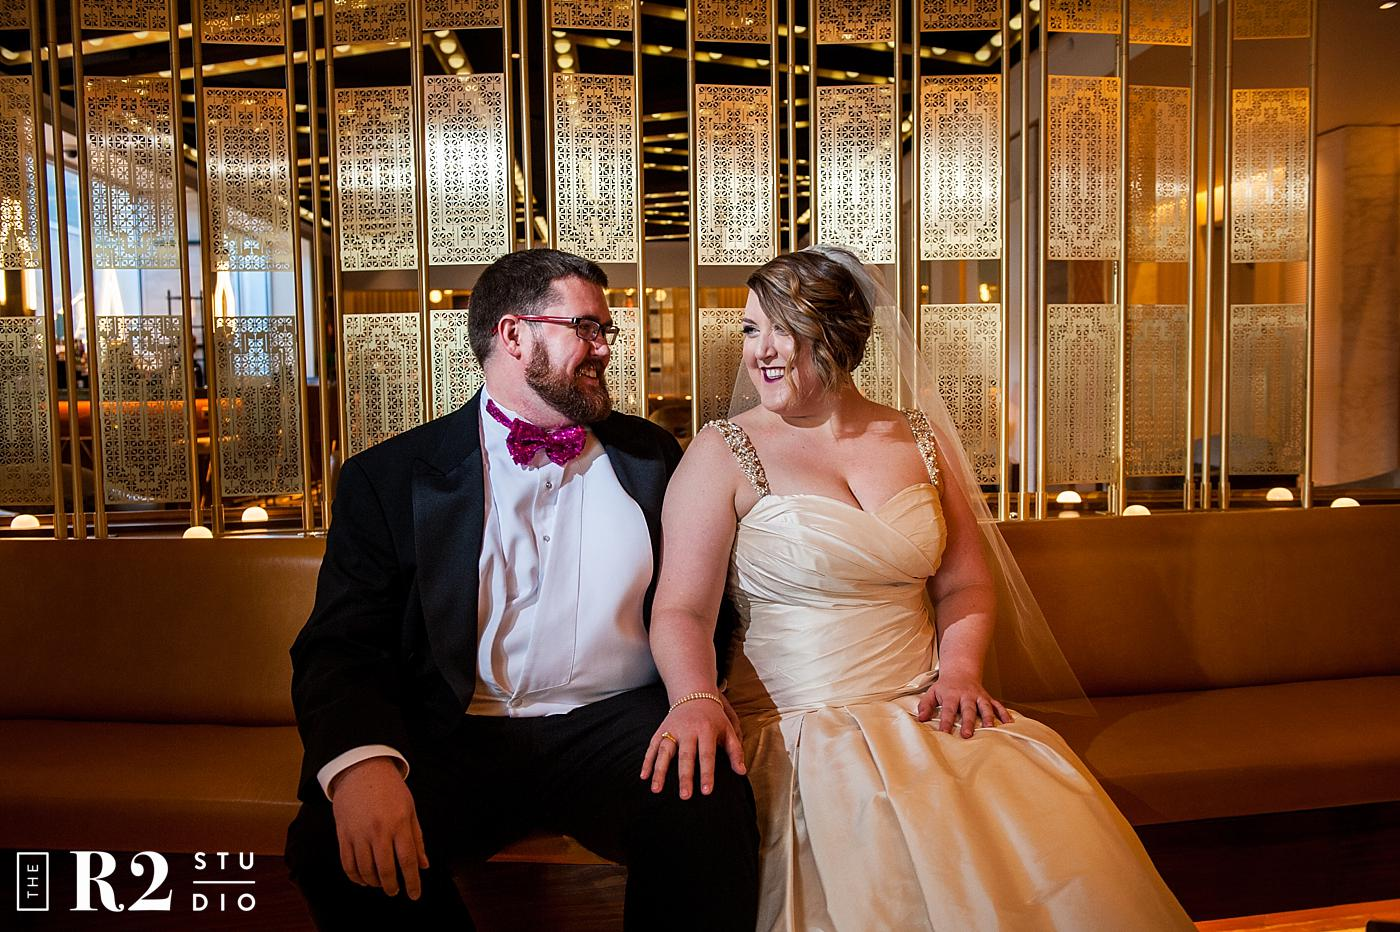 #slslasvegaswedding #slslasvegas #firstlook #brideandgroom #weddingslslasvegas #slslasvegas #desirableeventsbydesi, #weddingplannerlasvegas,#lasvegasweddingcoordinators,#weddingcoordinatorslasvegas,#weddingcoordinatorlasvegas,#lasvegasweddingplanner #desirableeventsbydesi #Tropicanawedding #wedding, #love, #lovewins, #samesexwedding, #gaywedding, #tropicana, #lasvegaswedding, #weddinglasvegas, #weddingplannerslasvegas, #lasvegasweddingplanners, # layersoflovely, #lasvegaswedding, #susieandwill, #rusticwedding, #wedding, #historic5thstreetschool, #downtownlasvegas, #sls, #sayersclub, #bazaarmeats, #slslv, #slslasvegas #slsweddings, #lasvegasweddings,